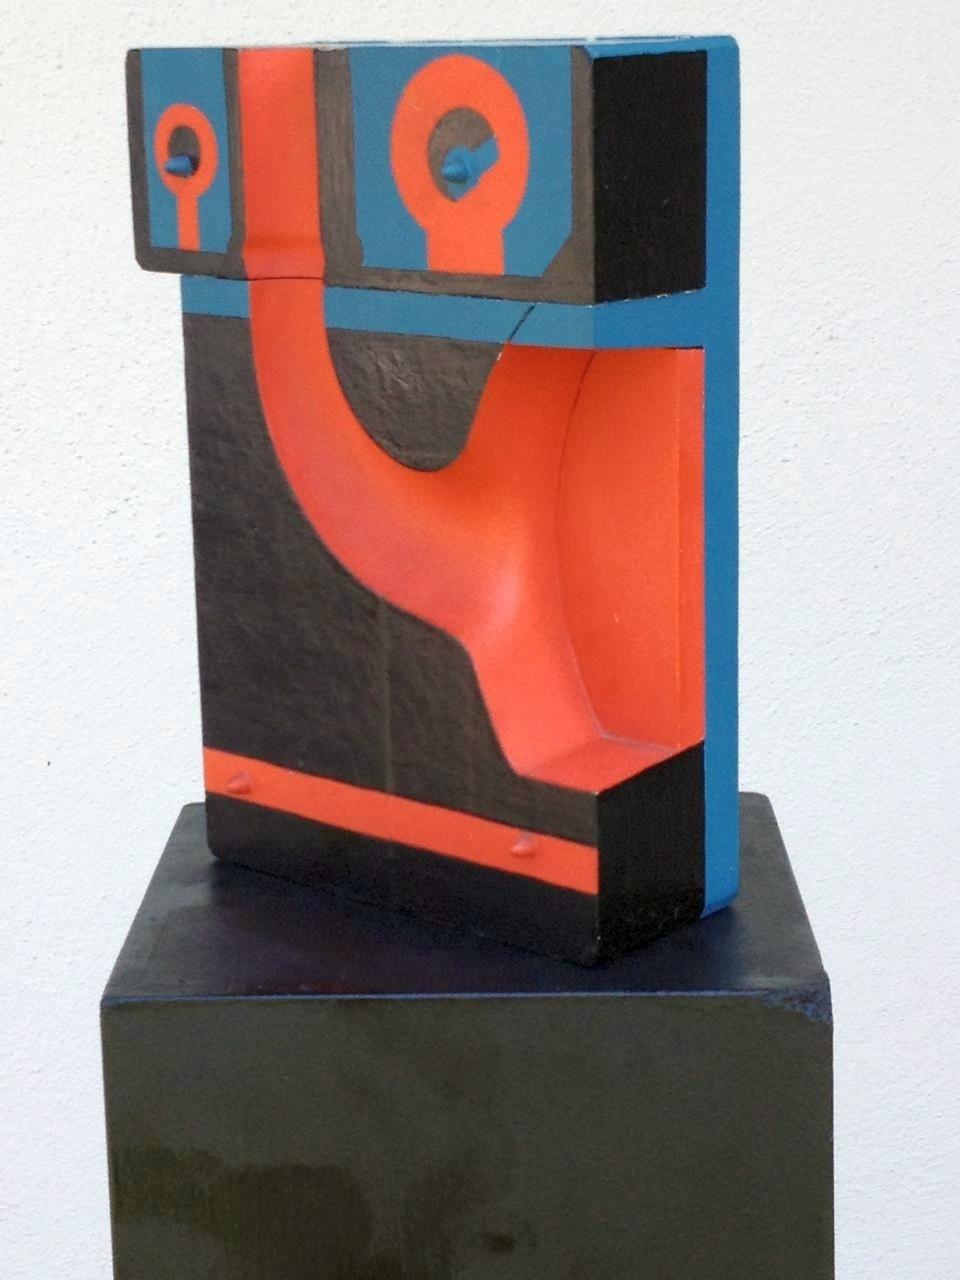 Technik-Idol 1, Holzobjekt farbig bemalt, 26 x 12 x 12 cm, 1971 (#563)